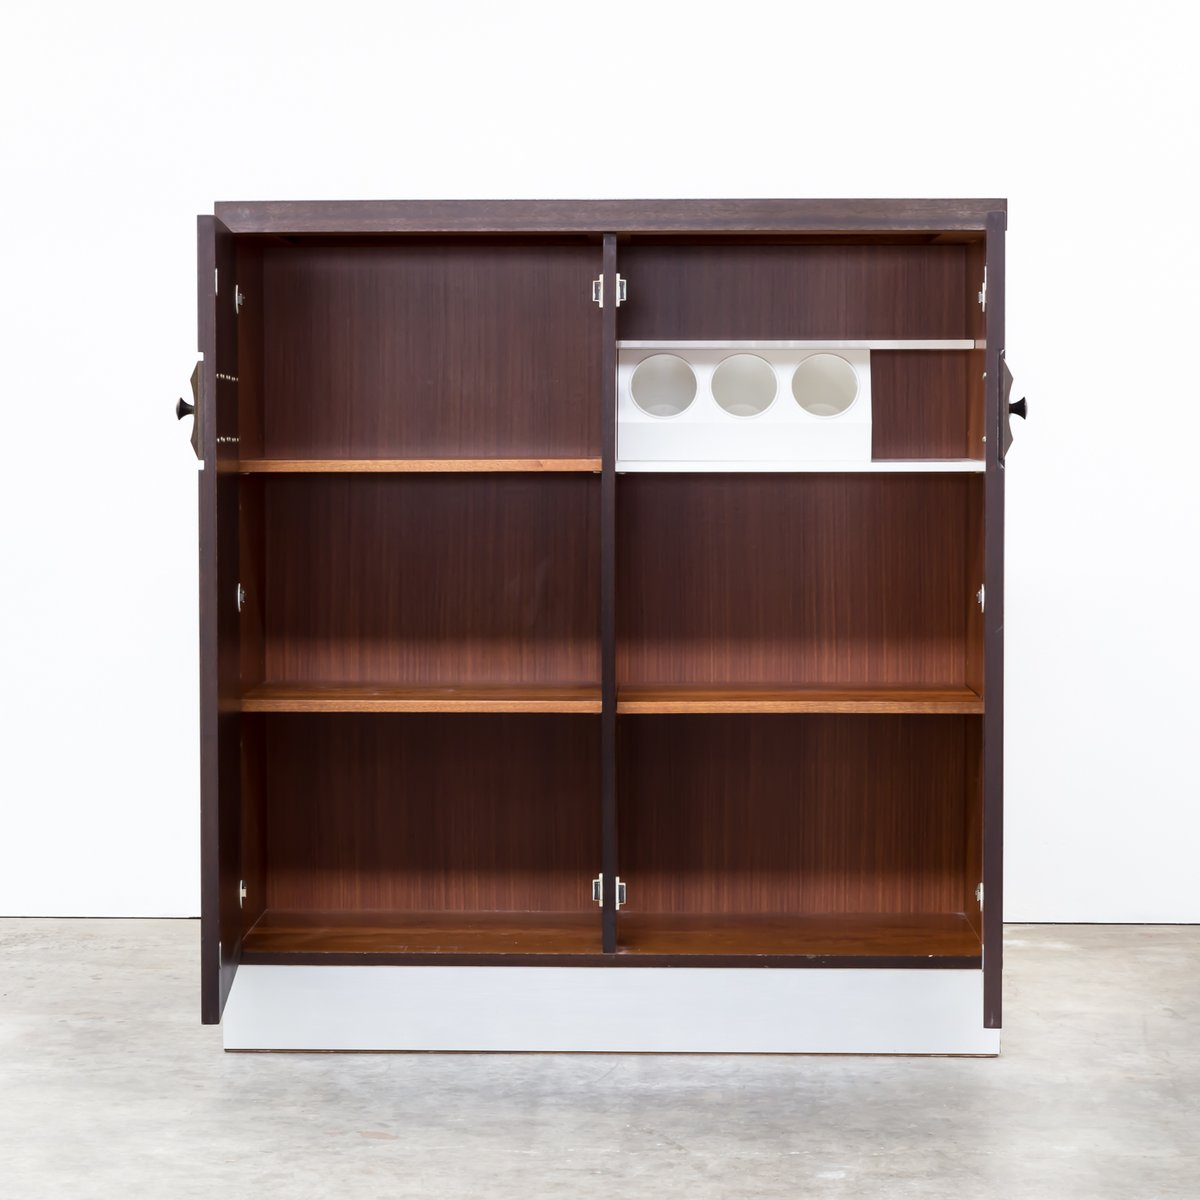 hohes belgisches brutalistisches sideboard 1970er bei. Black Bedroom Furniture Sets. Home Design Ideas